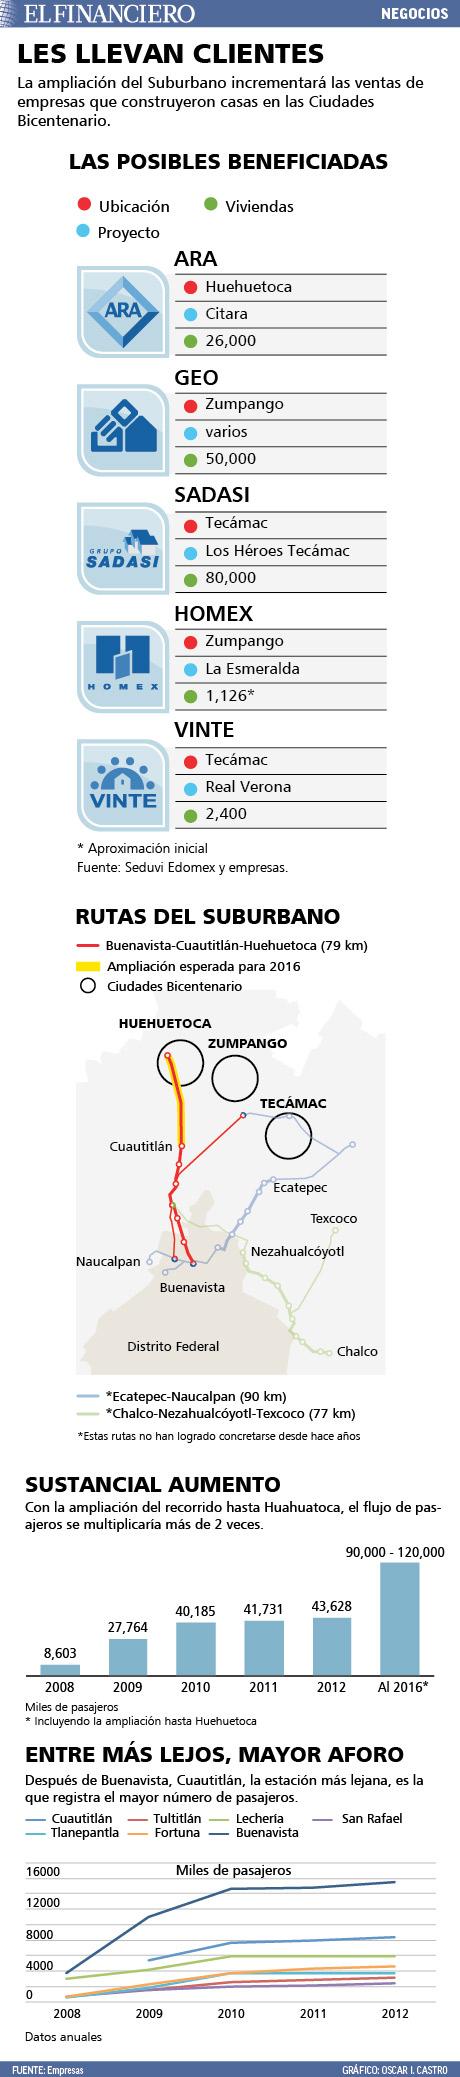 """la_ampliacion_del_suburbano"""